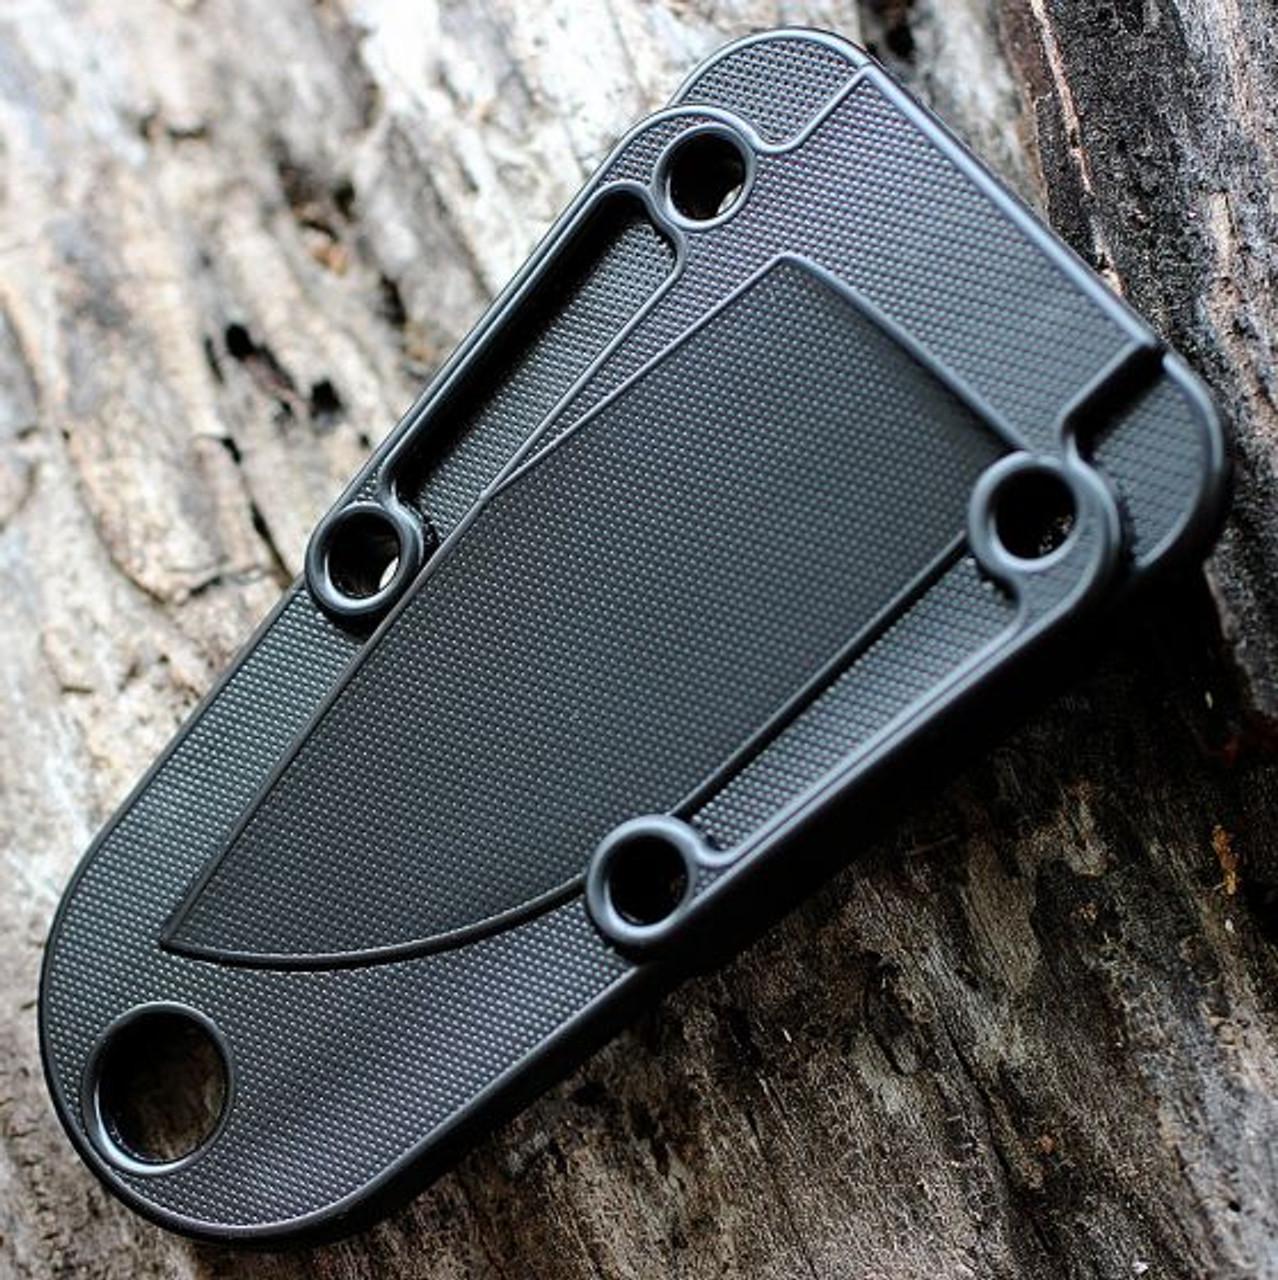 ESEE IZULA Knife, Dark Earth, Concealed Carry Knife, Clip Plate